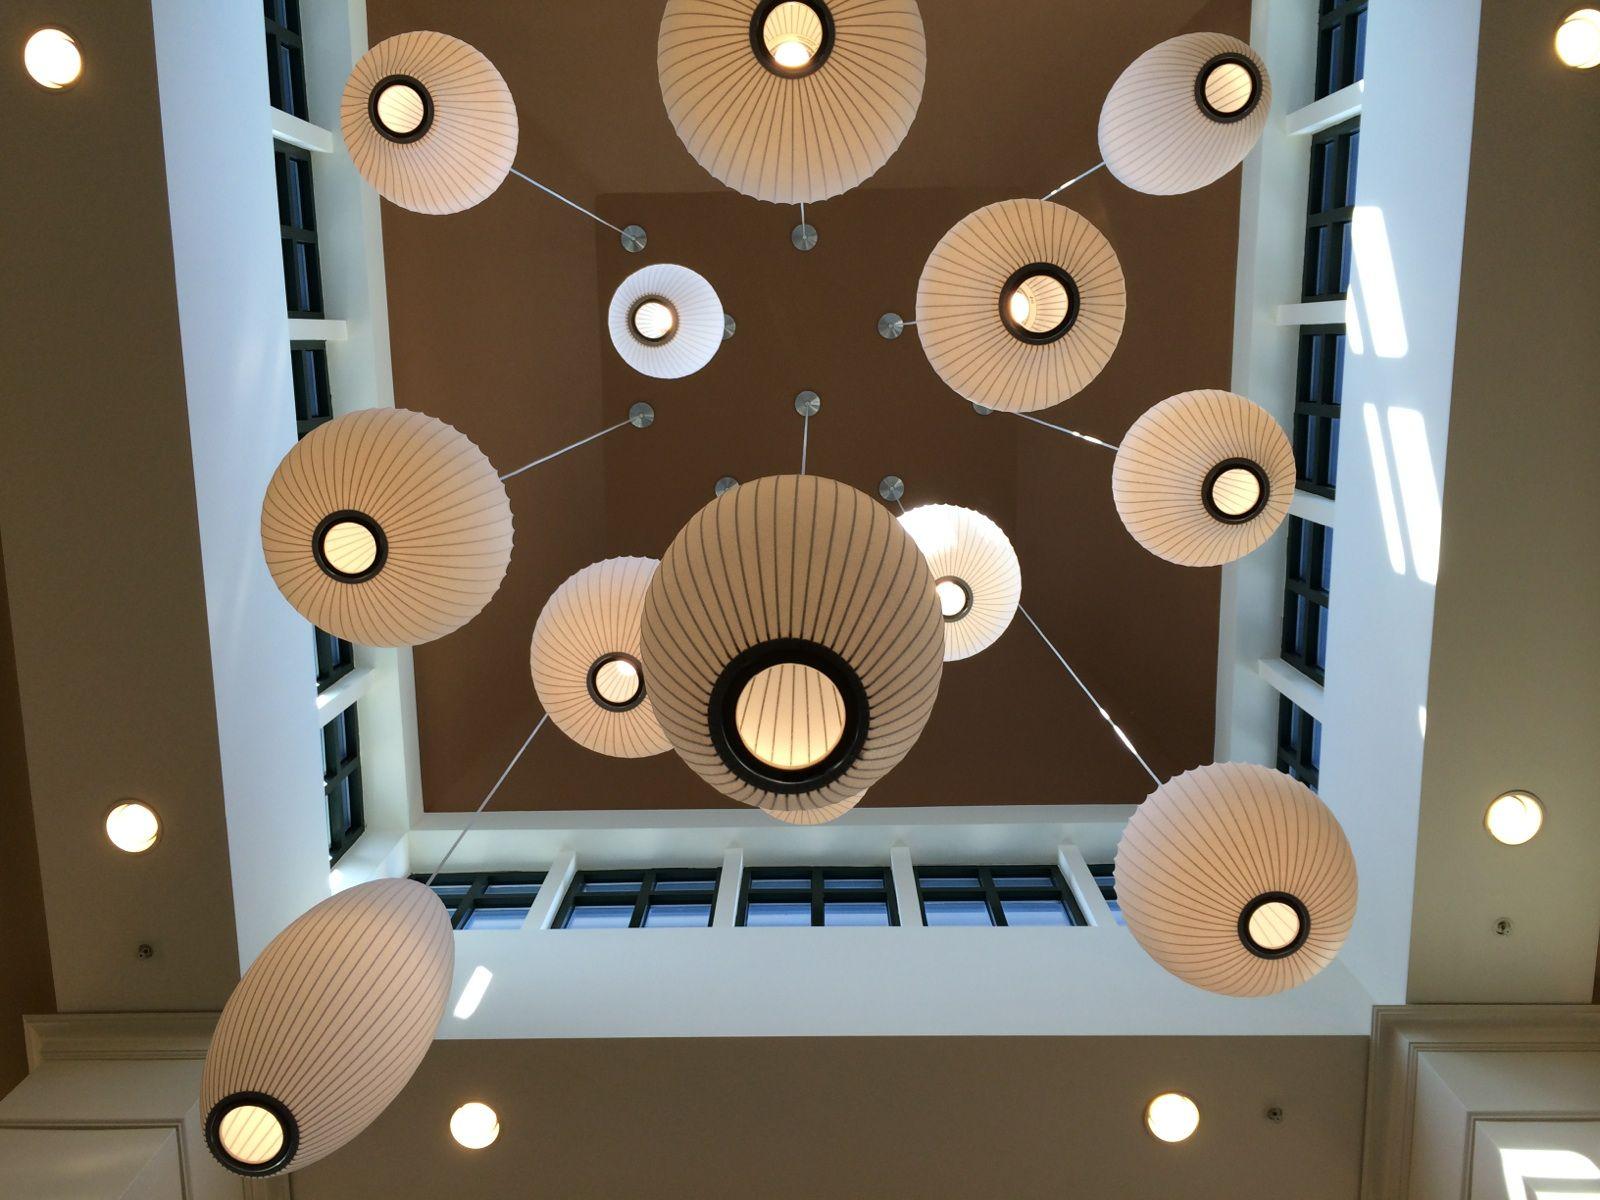 Lobby Lanterns | Hilton Garden Inn Fishkill NY | Pinterest